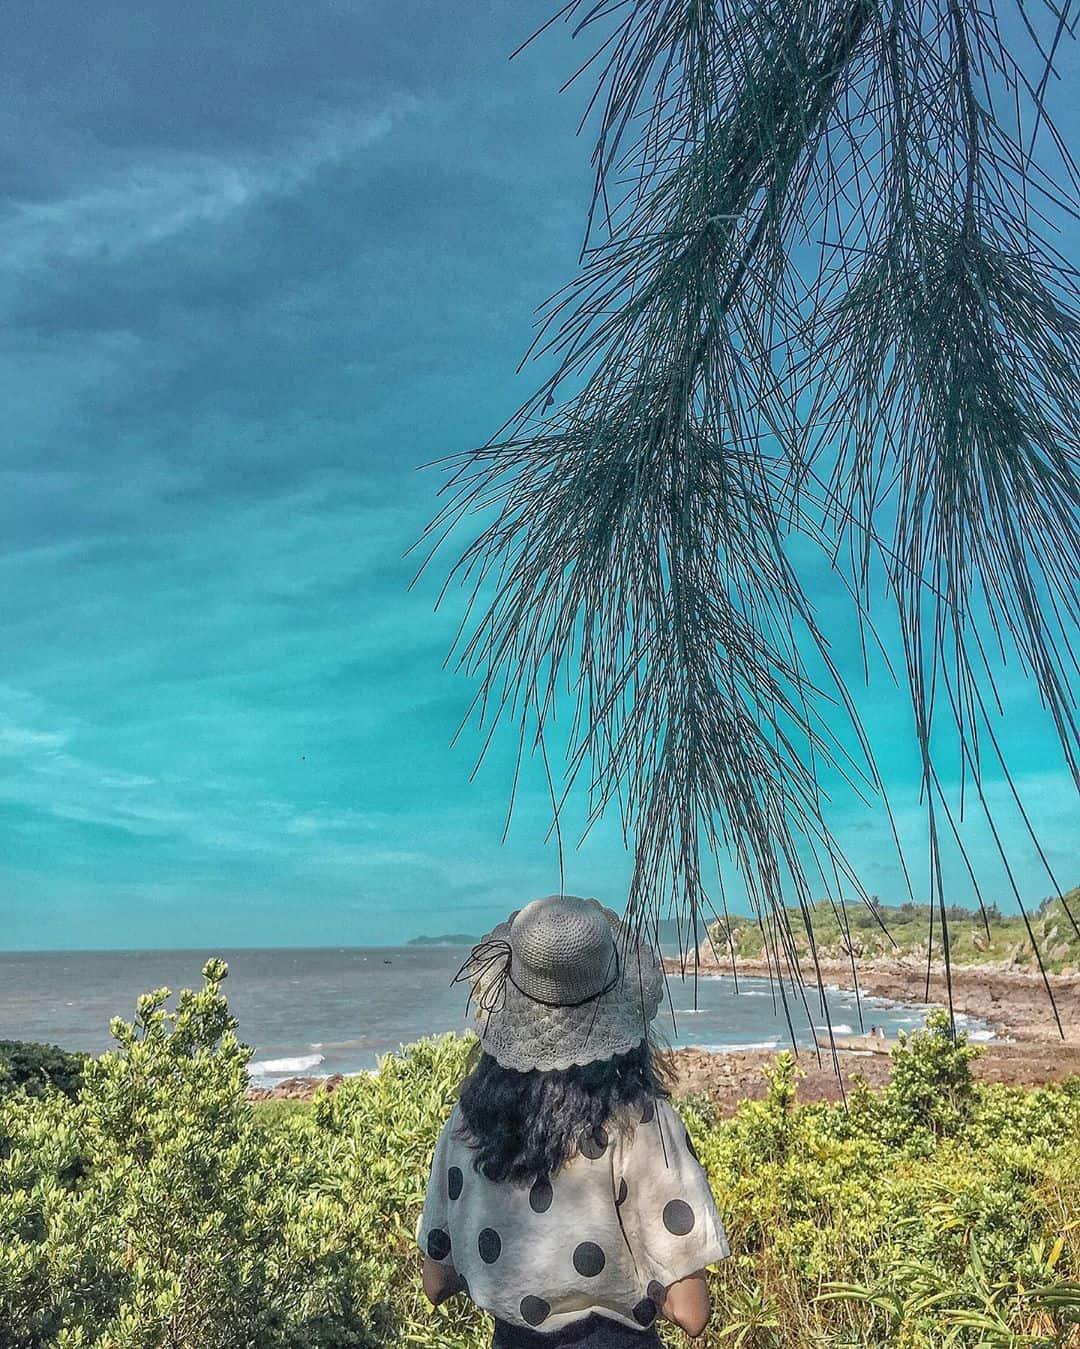 Admiring beautiful beaches in Quan Lan island